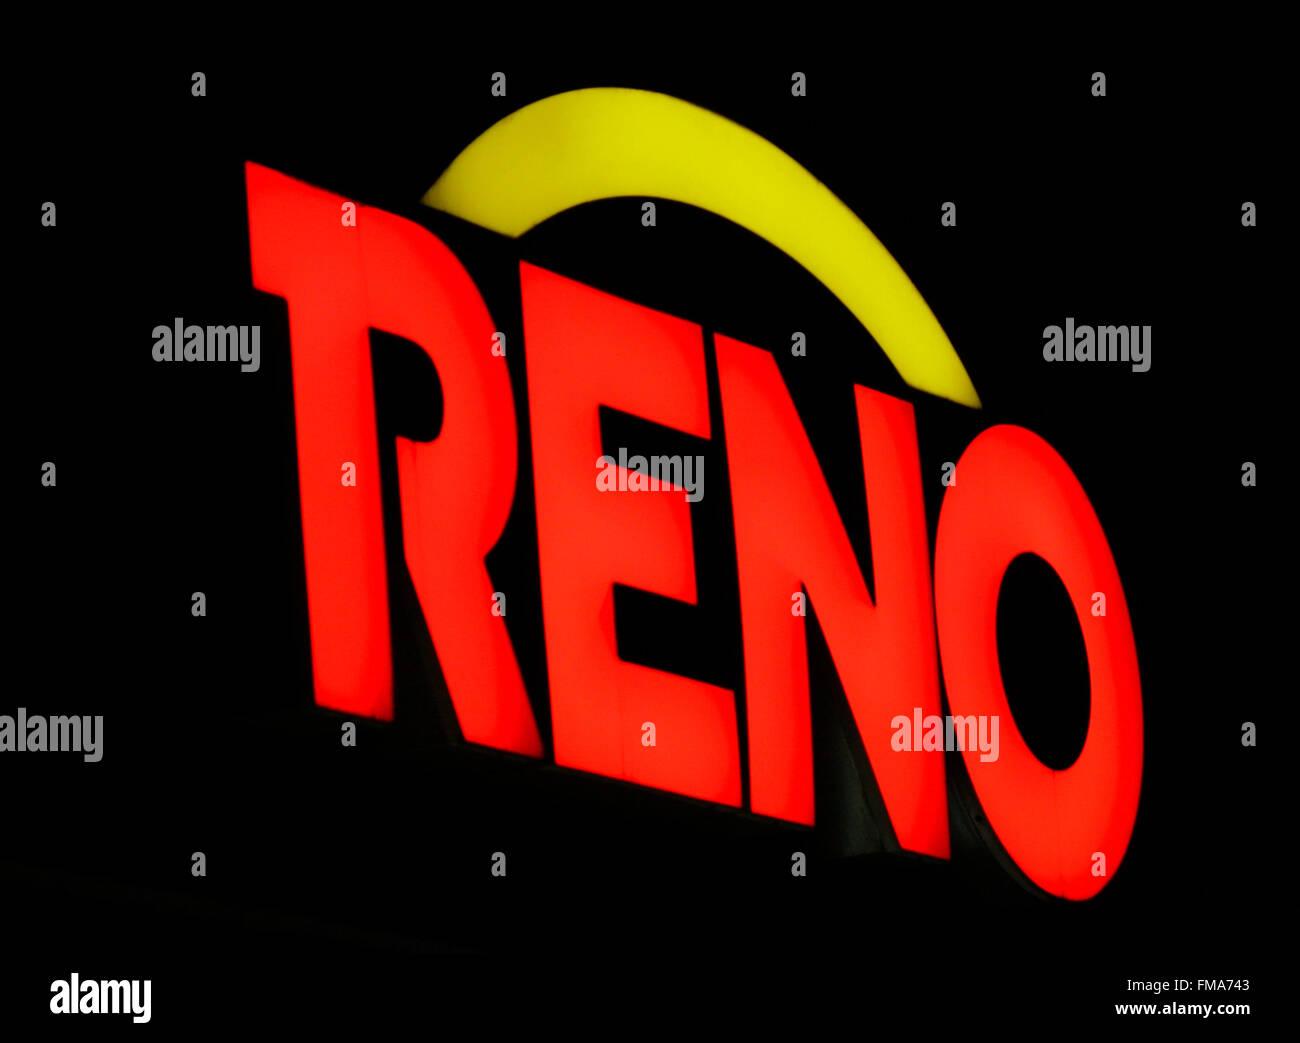 Markenname: 'Reno', Dezember 2013, Berlin. - Stock Image